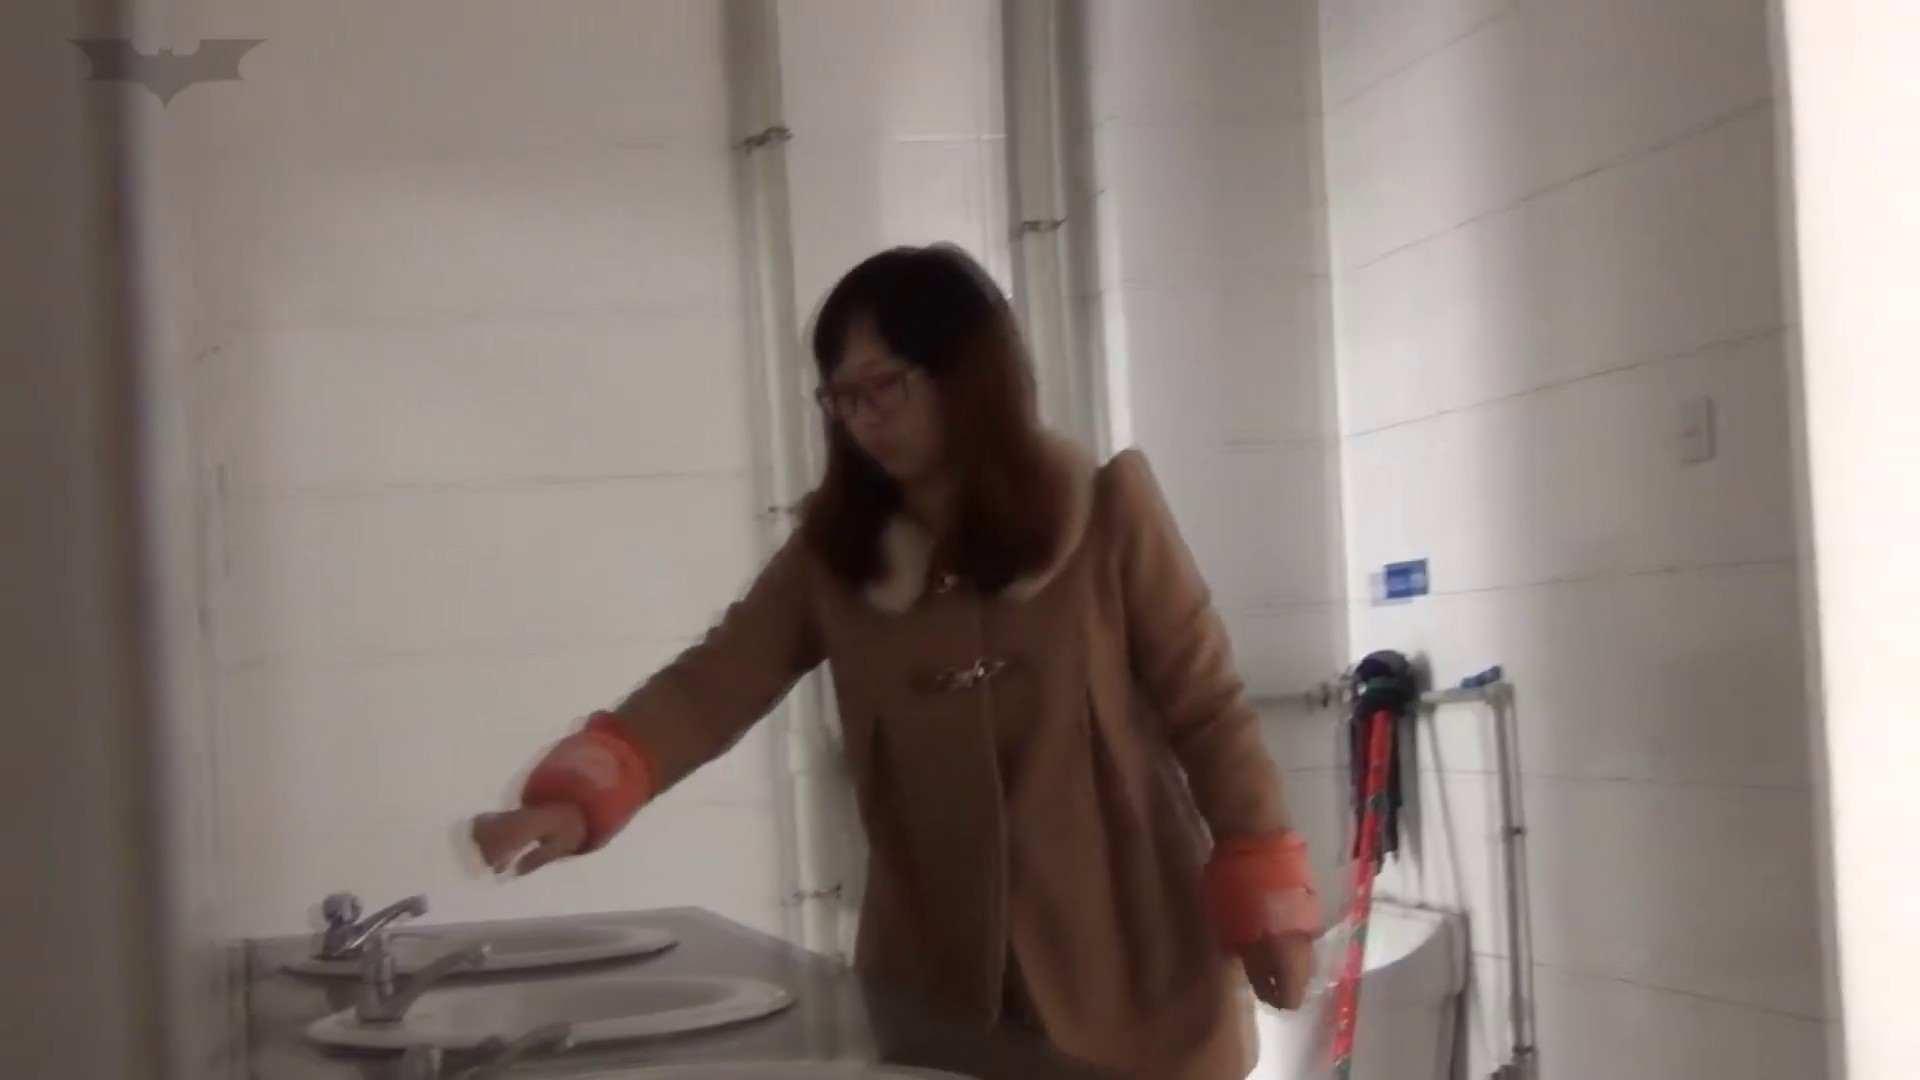 JD盗撮 美女の洗面所の秘密 Vol.34 美女のボディ ぱこり動画紹介 73PIX 24